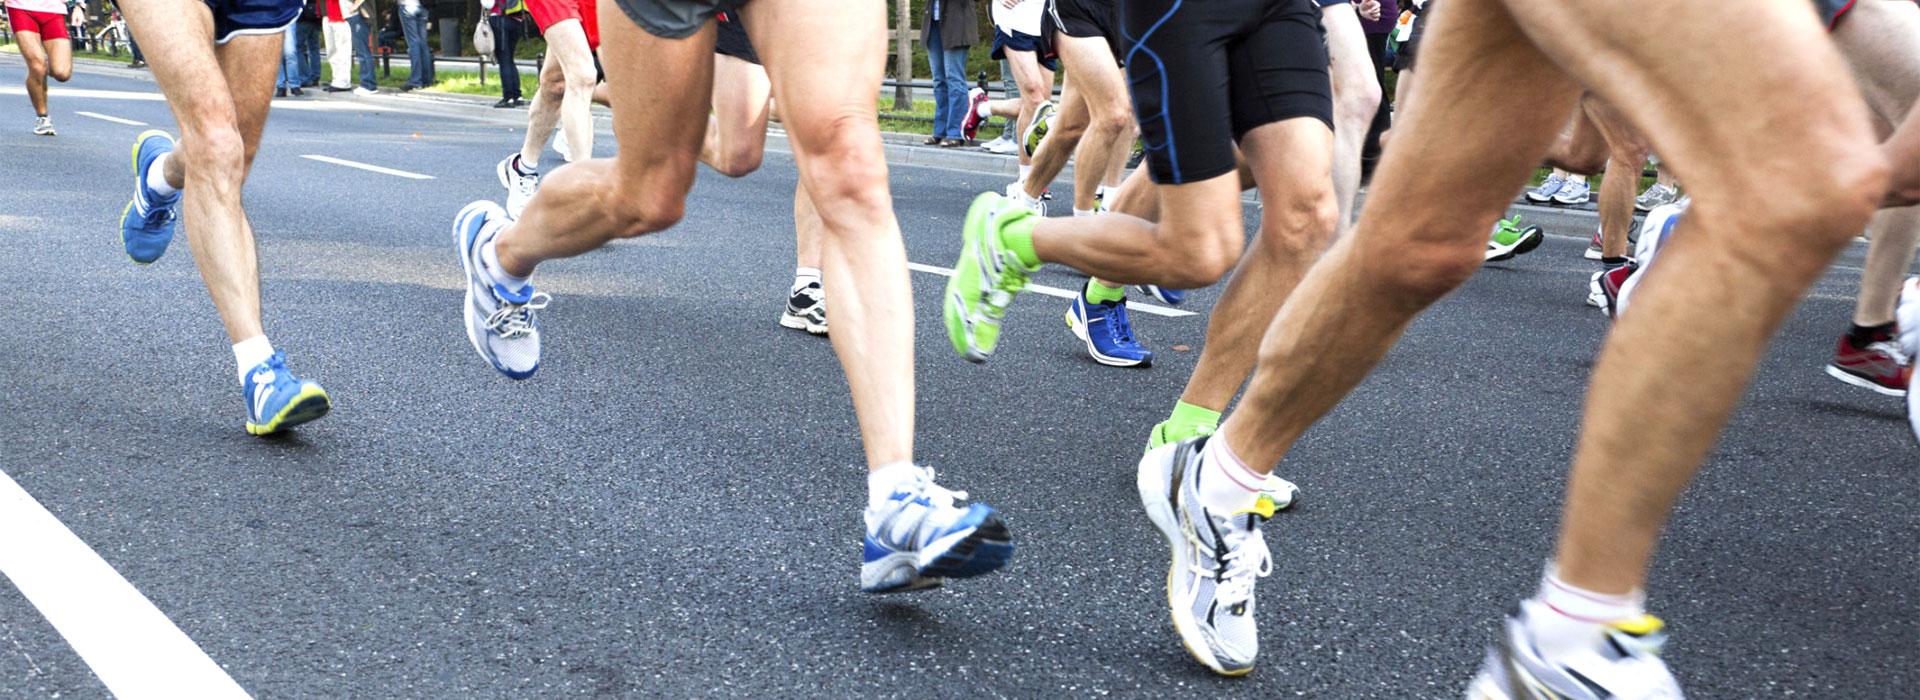 sistime-cindy-zeus-meia-maratona-2016